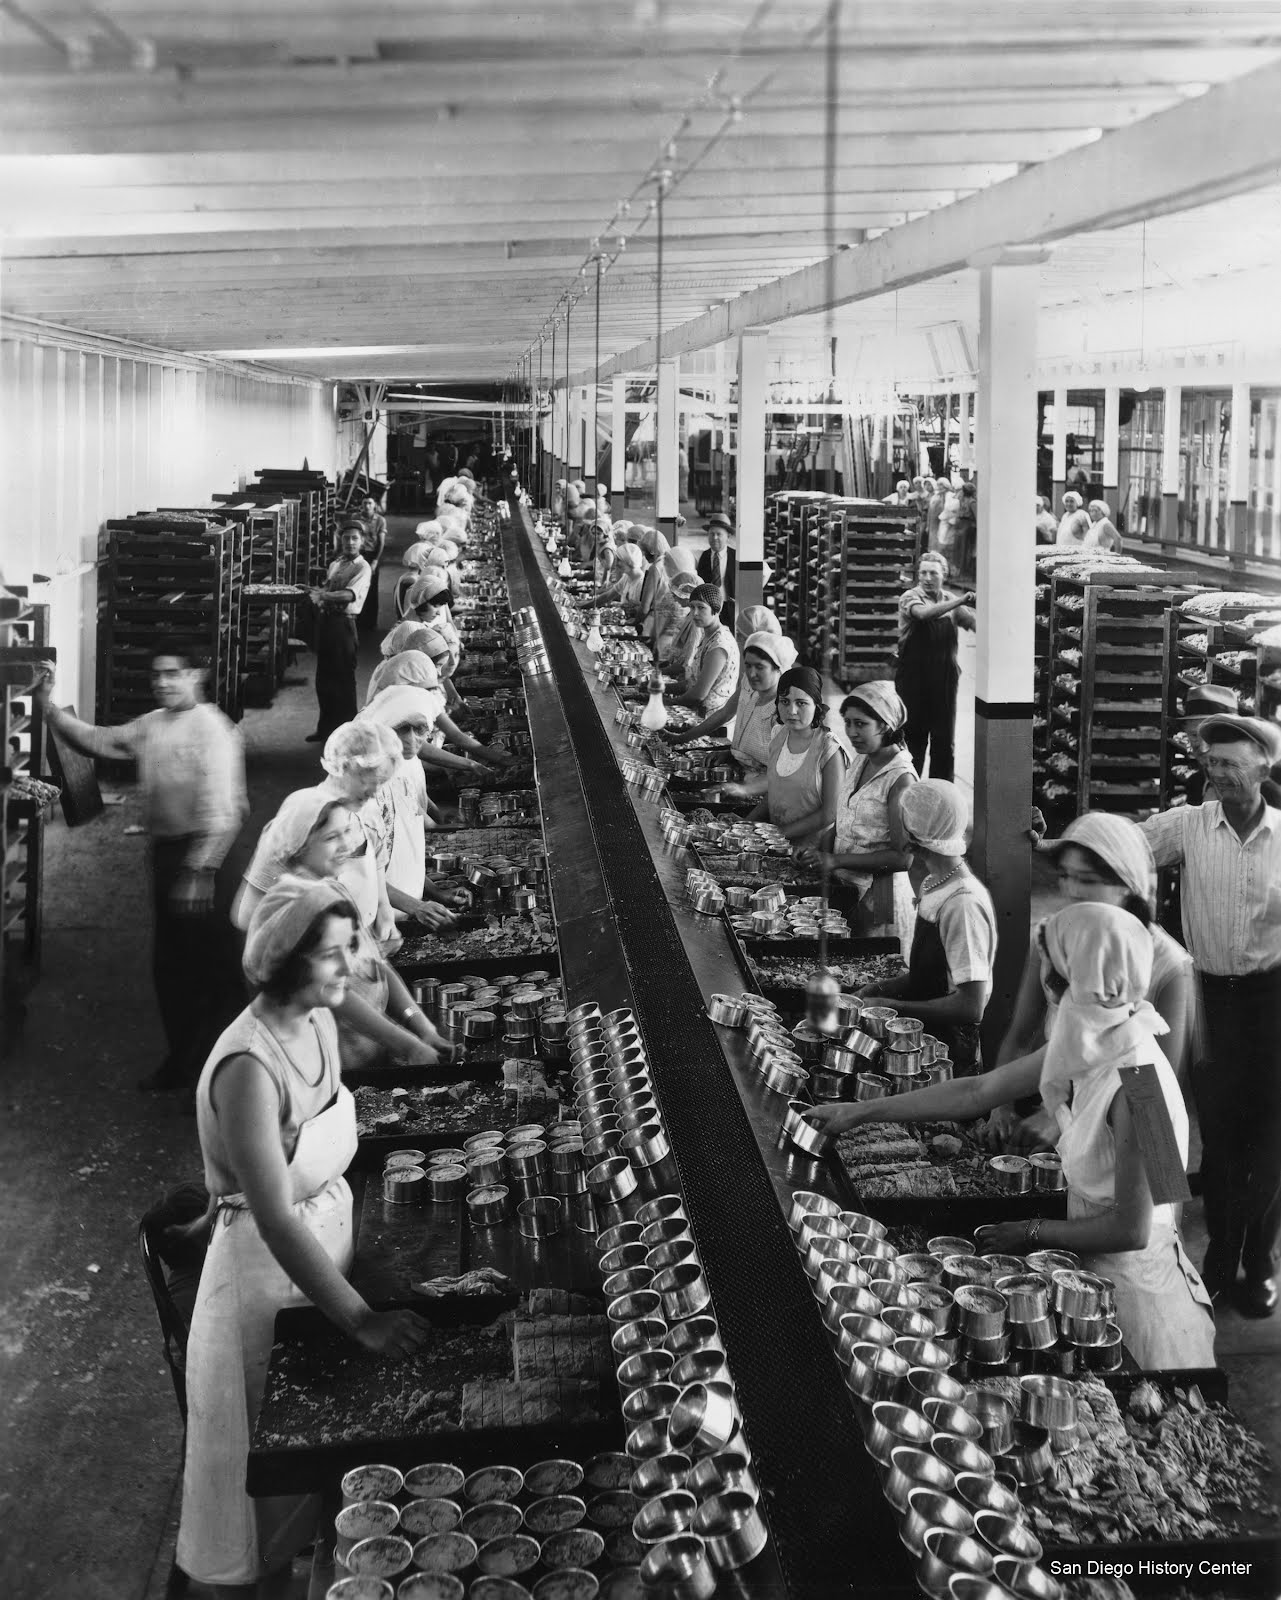 San Diego's Historic Tuna Industry